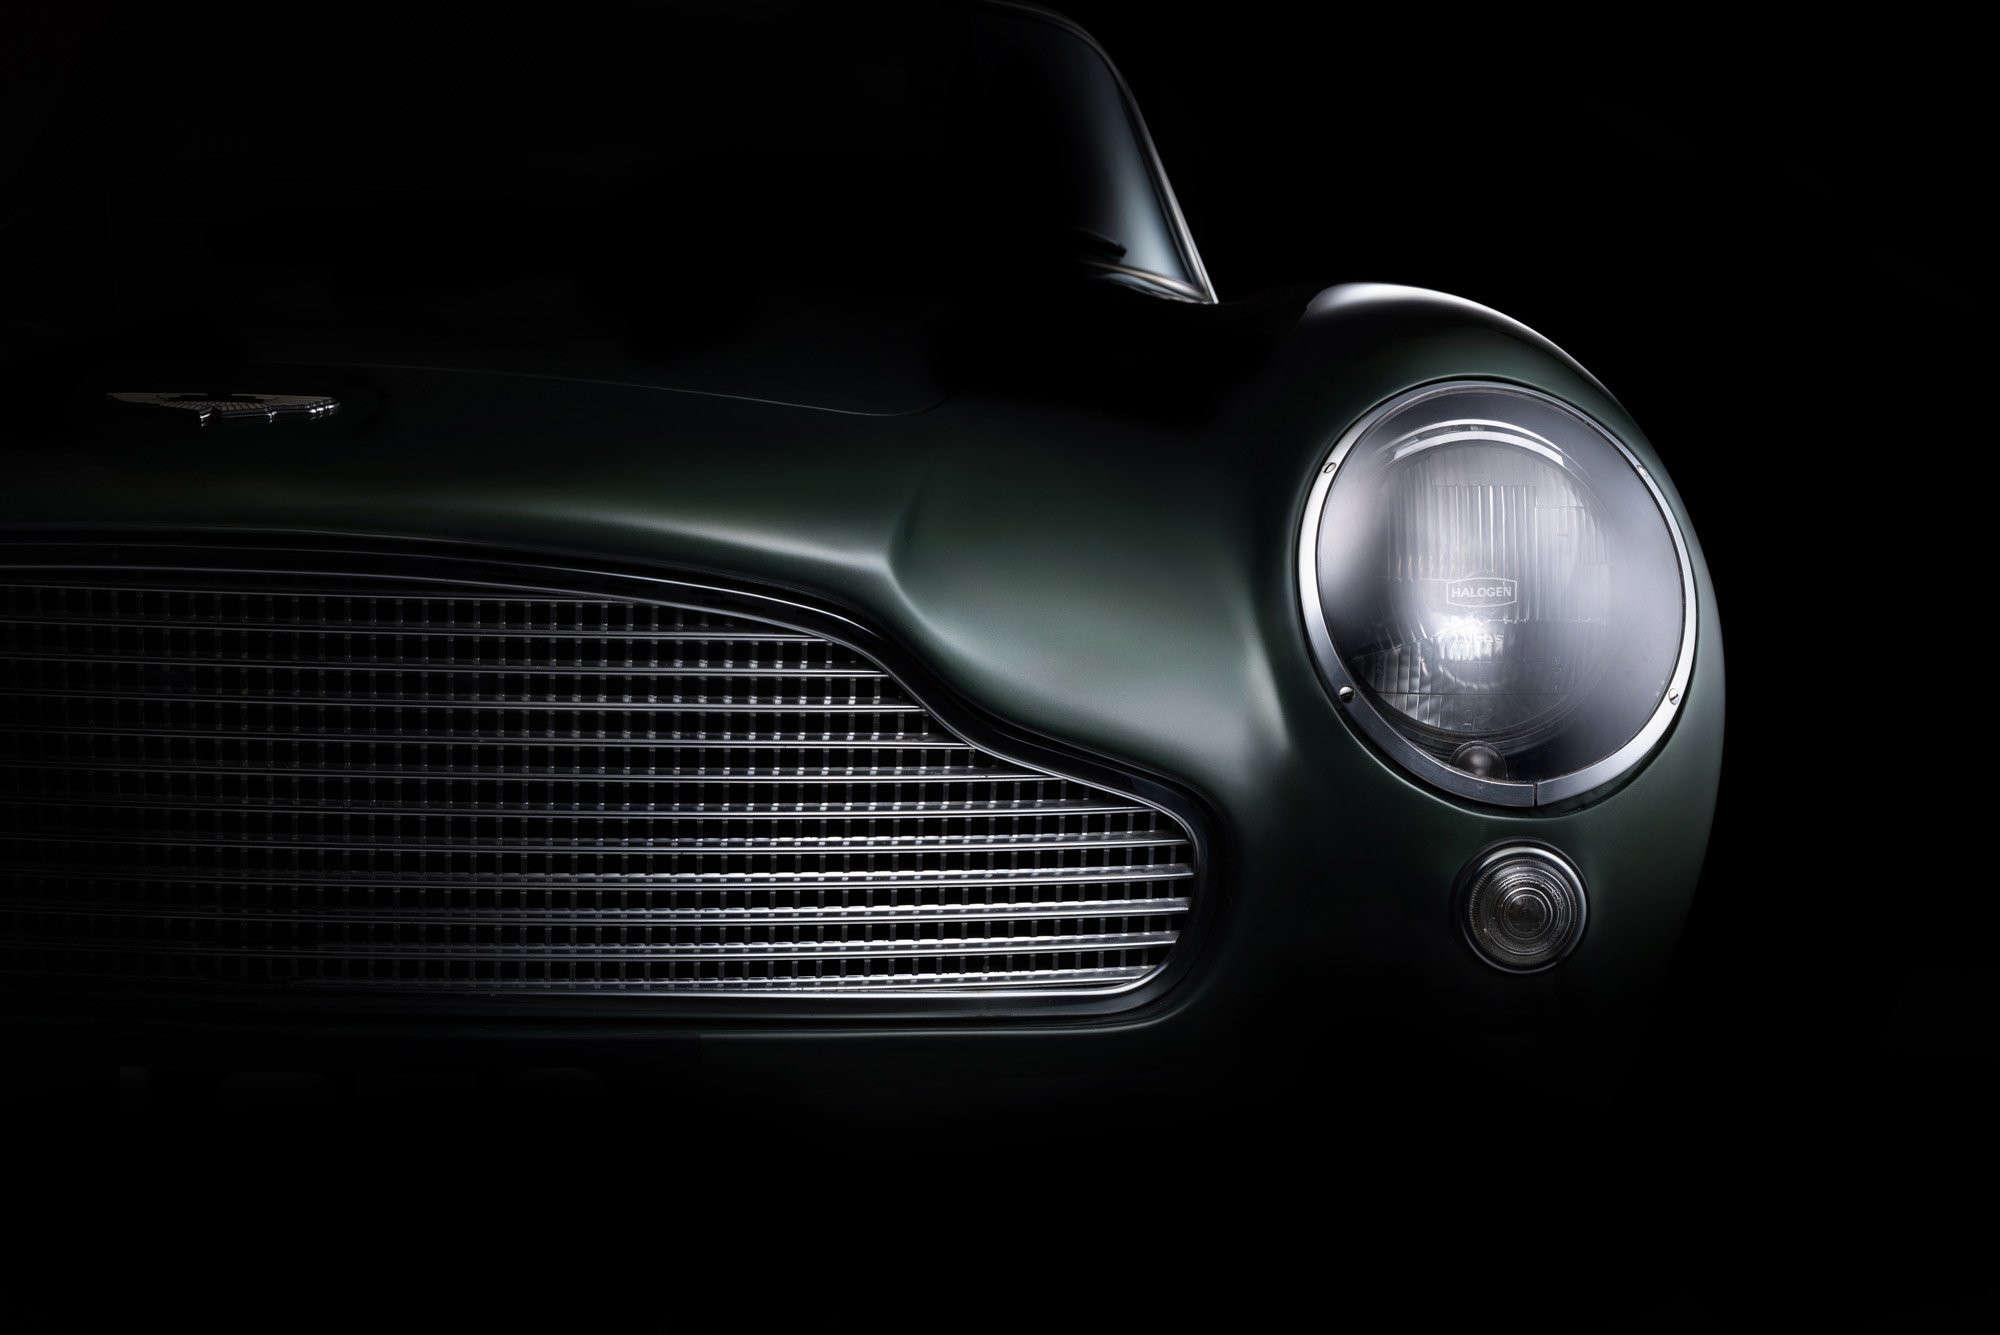 Sarel Van Staden Aston Martin DB GT Headlight - Aston martin headlights